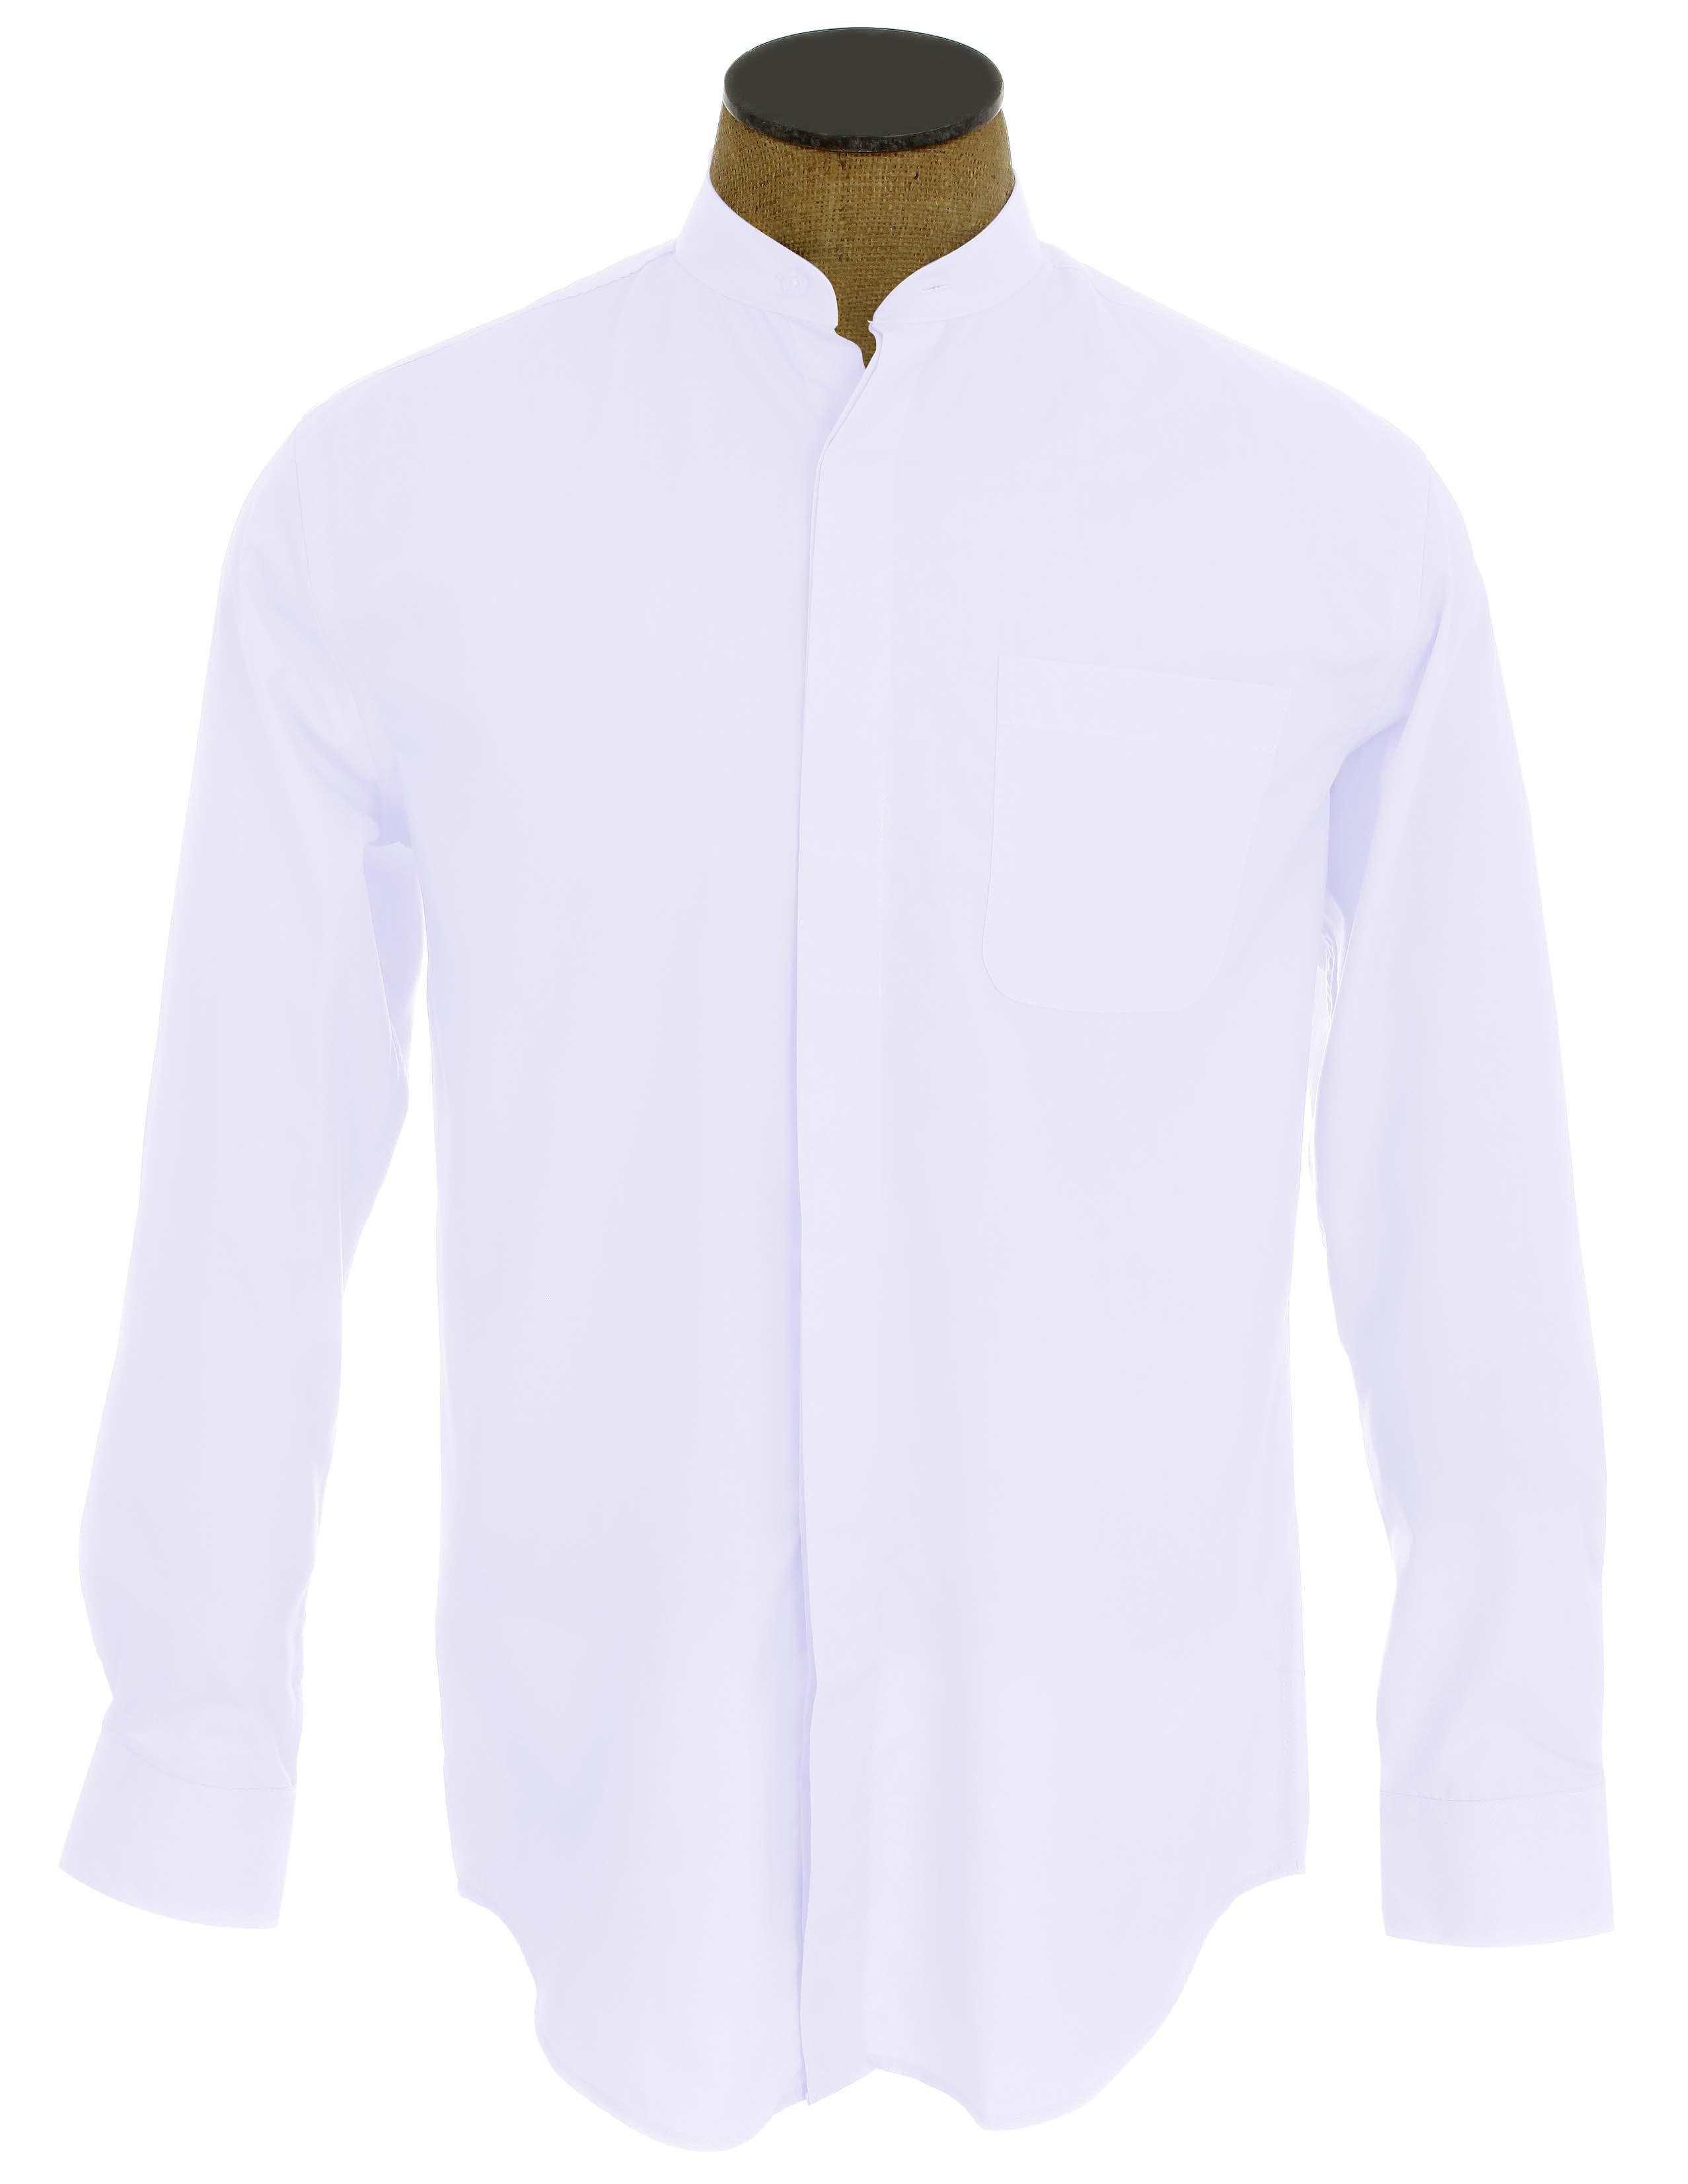 men 39 s collarless banded collar dress shirt ebay